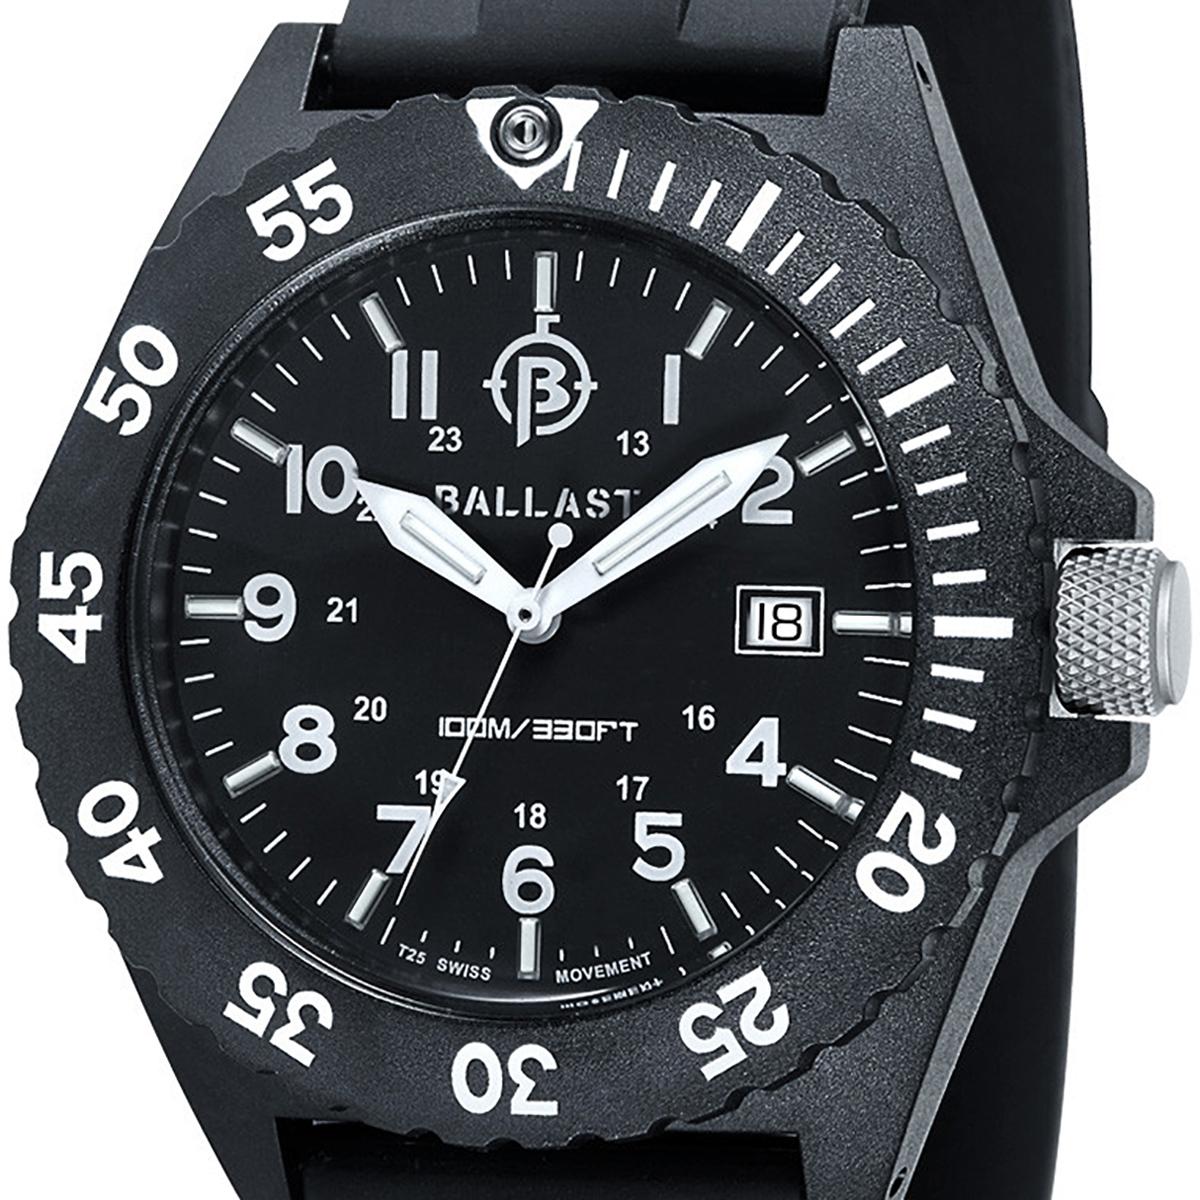 BALLAST バラスト クォーツ 腕時計 メンズ ミリタリー イギリス SWISS MADE [BL-3118-01] 並行輸入品 純正ケース メーカー保証24ヶ月